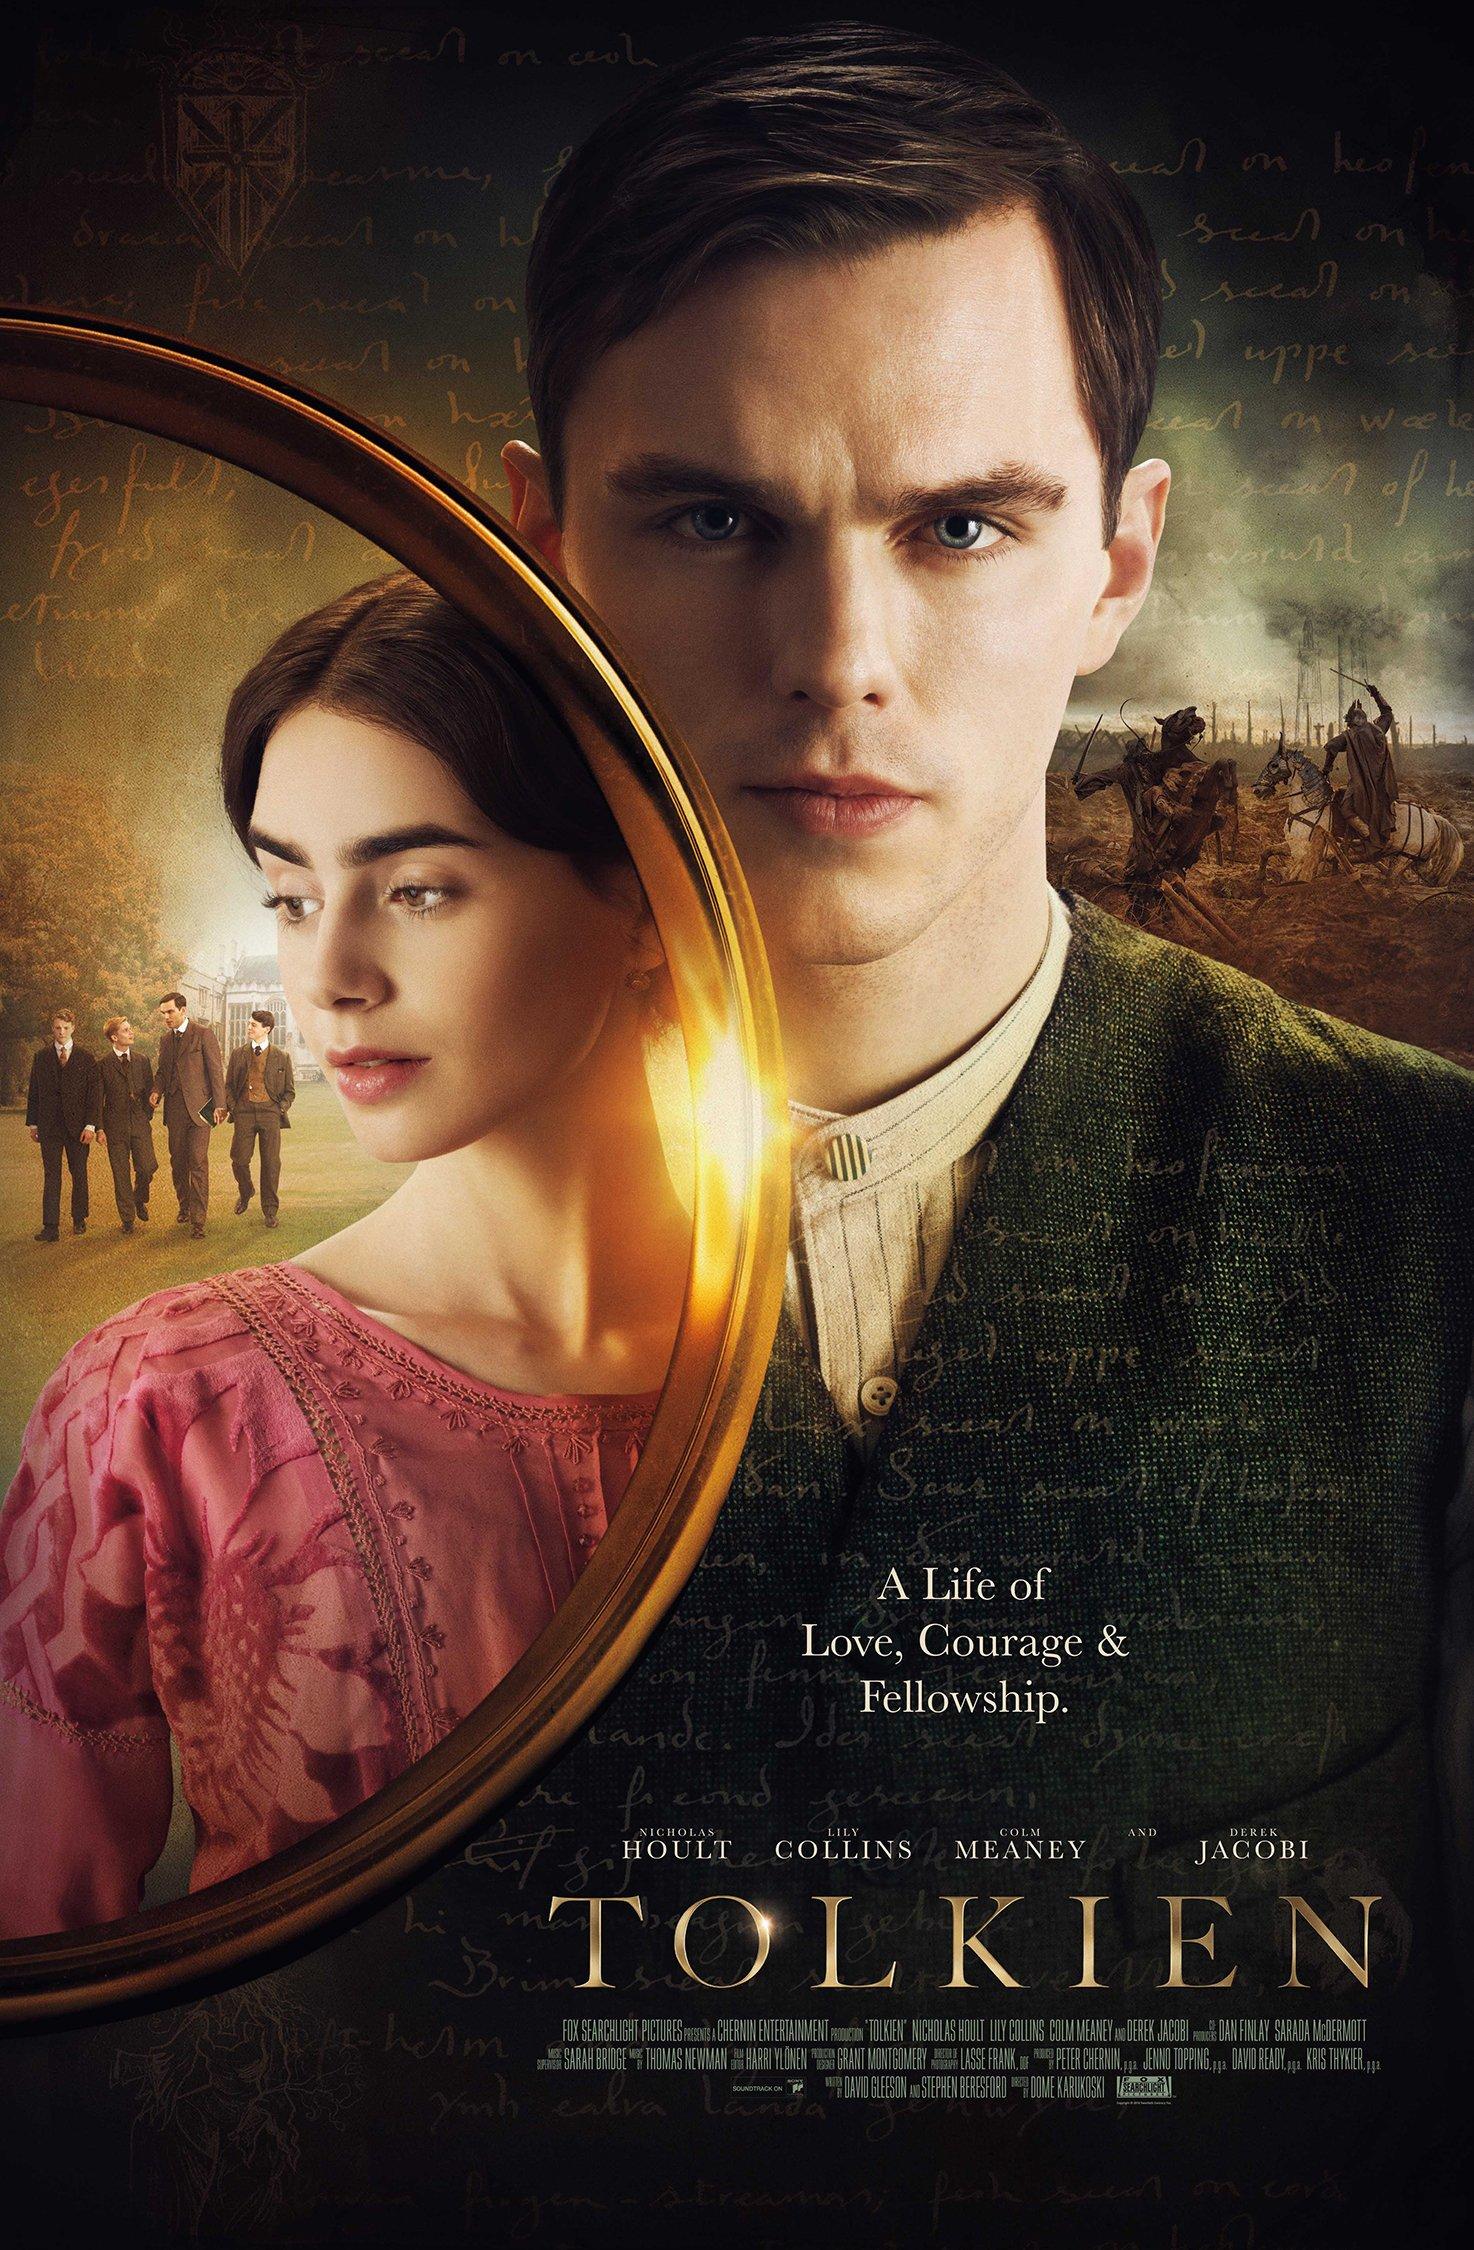 Толкиен, постер № 2